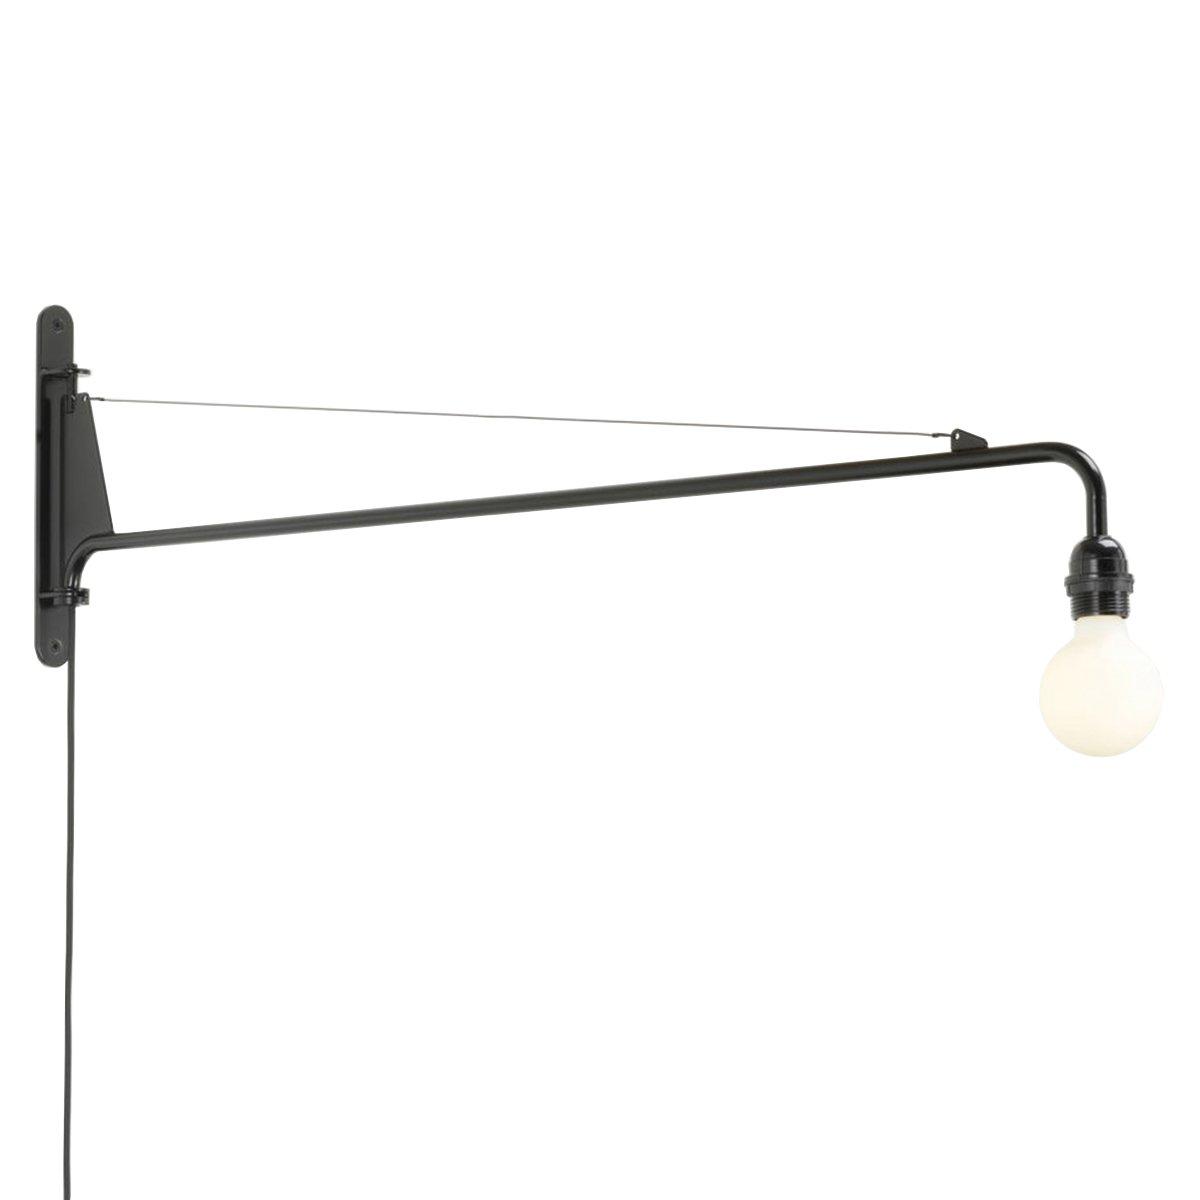 Vitra Petite Potence Wandlamp - Diepzwart